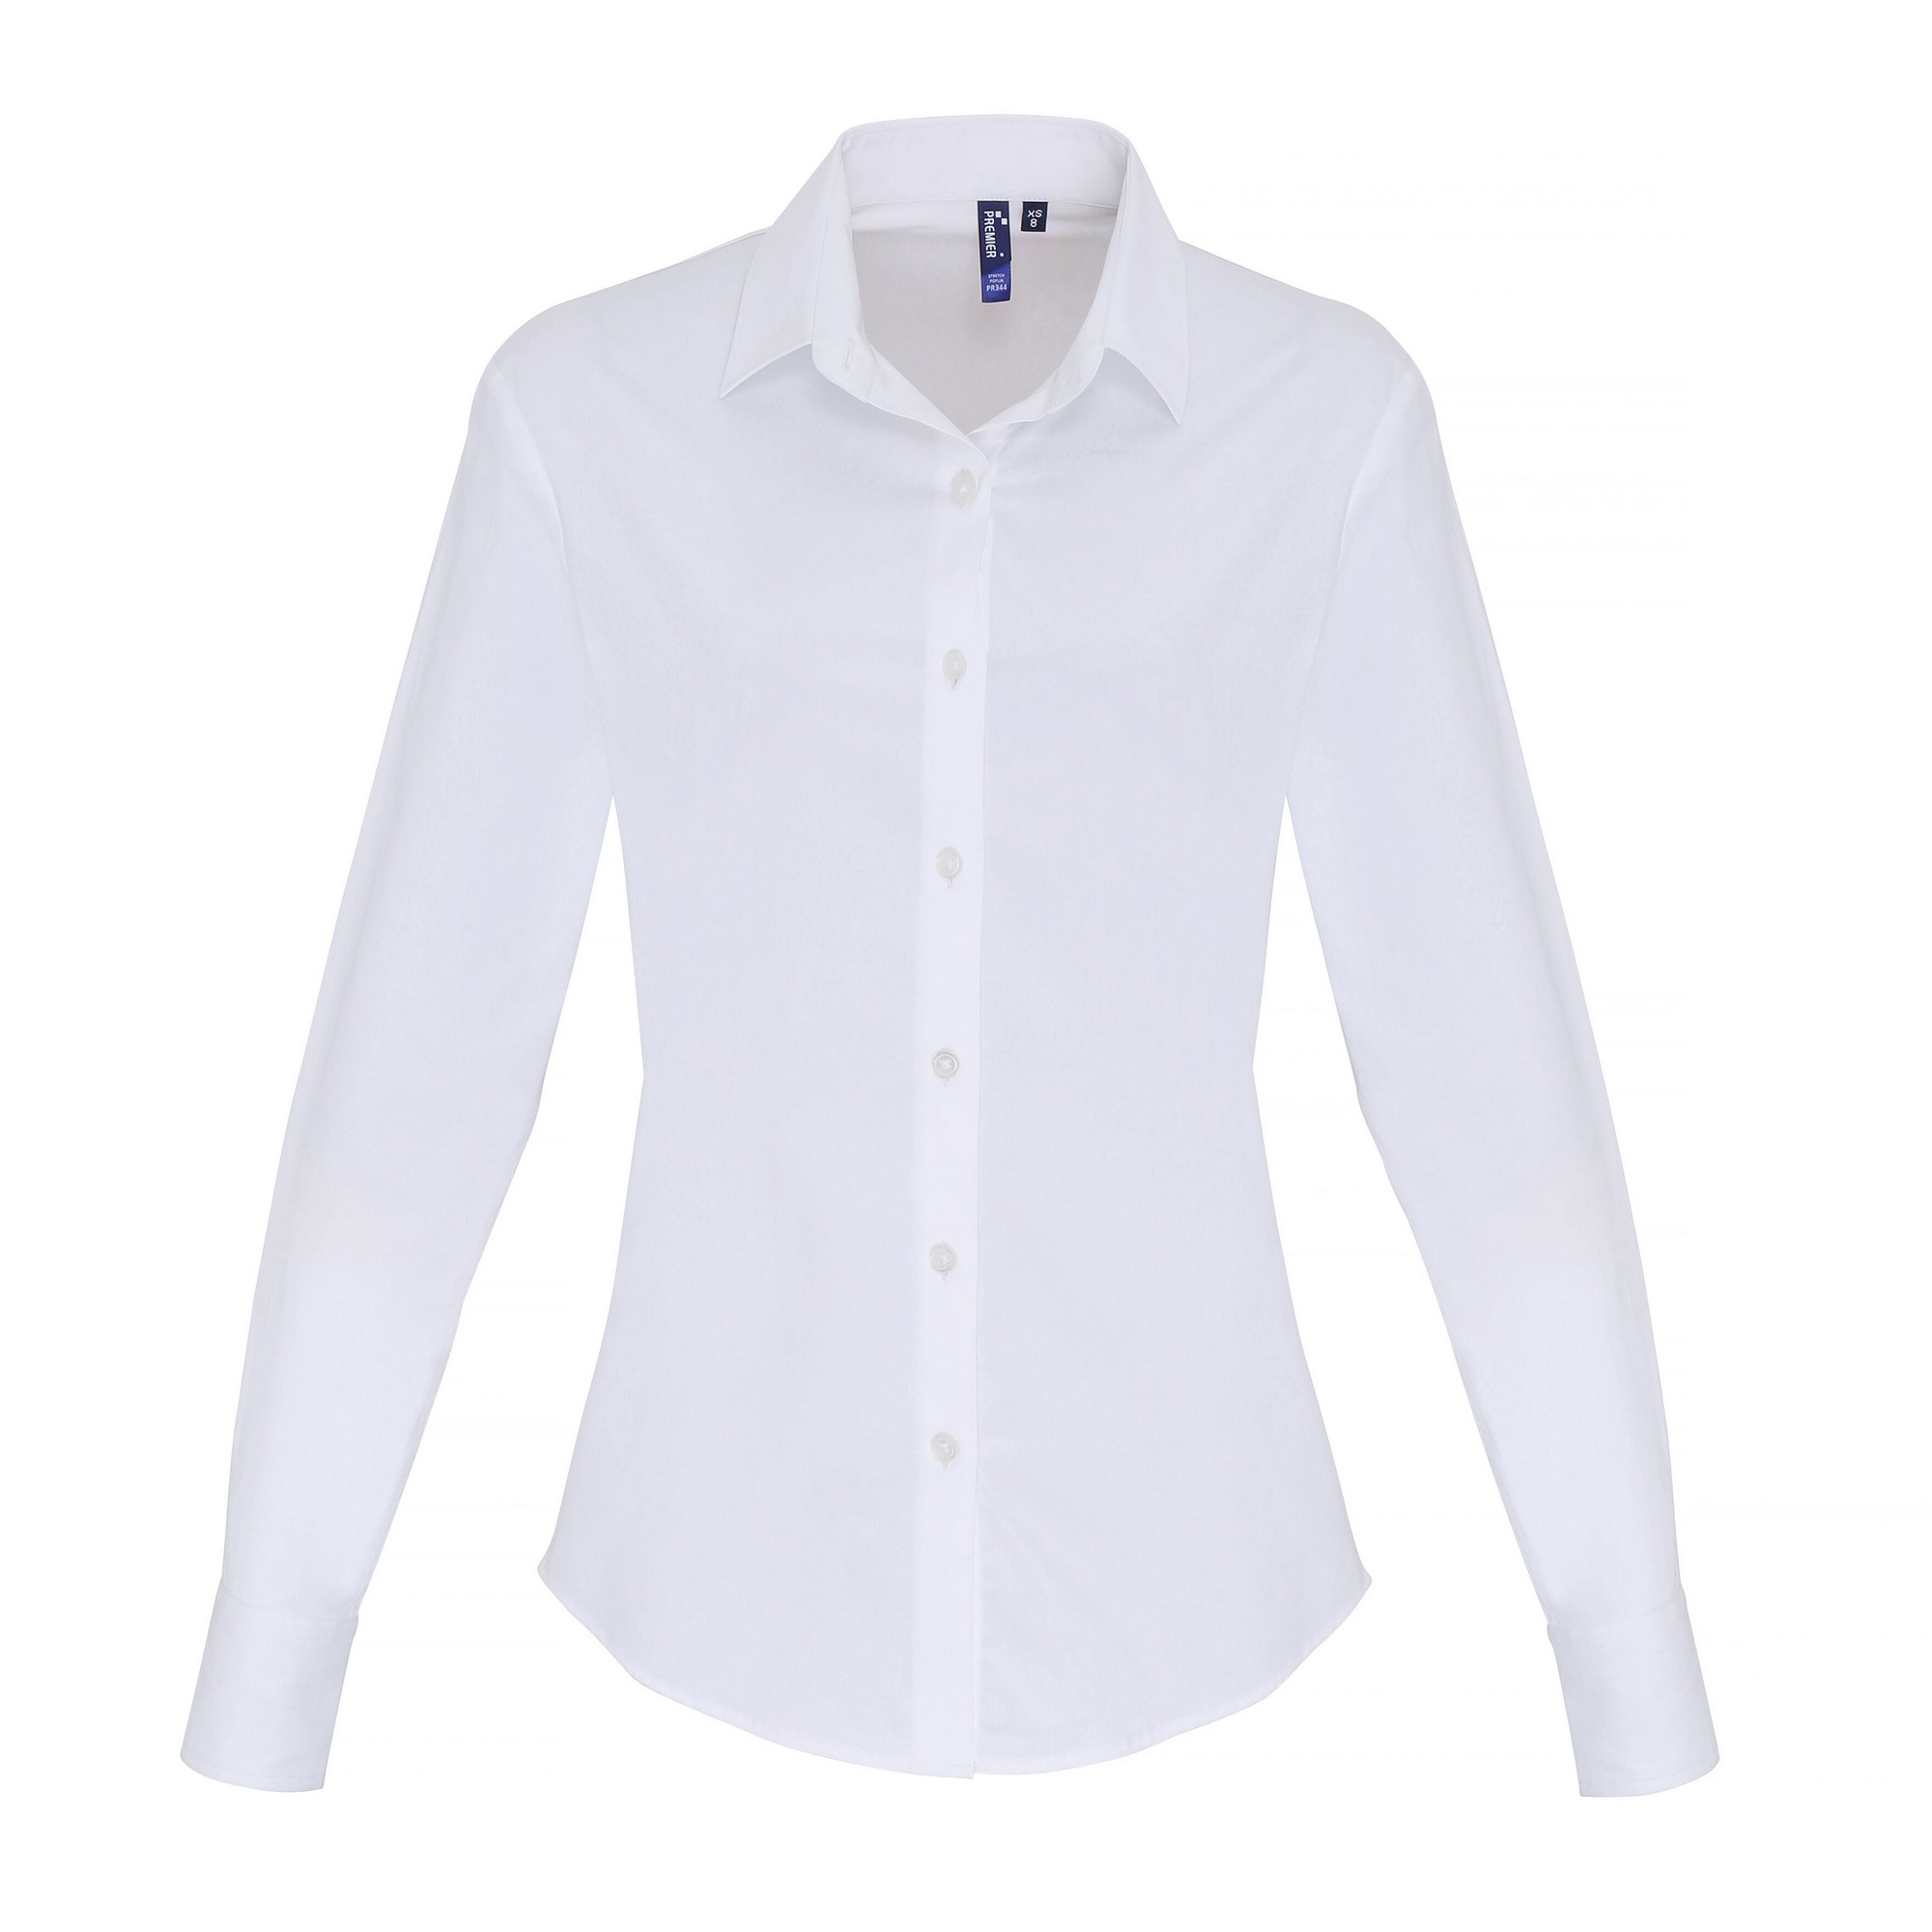 Premier Womens/Ladies Stretch Fit Poplin Long Sleeve Blouse (L) (White)